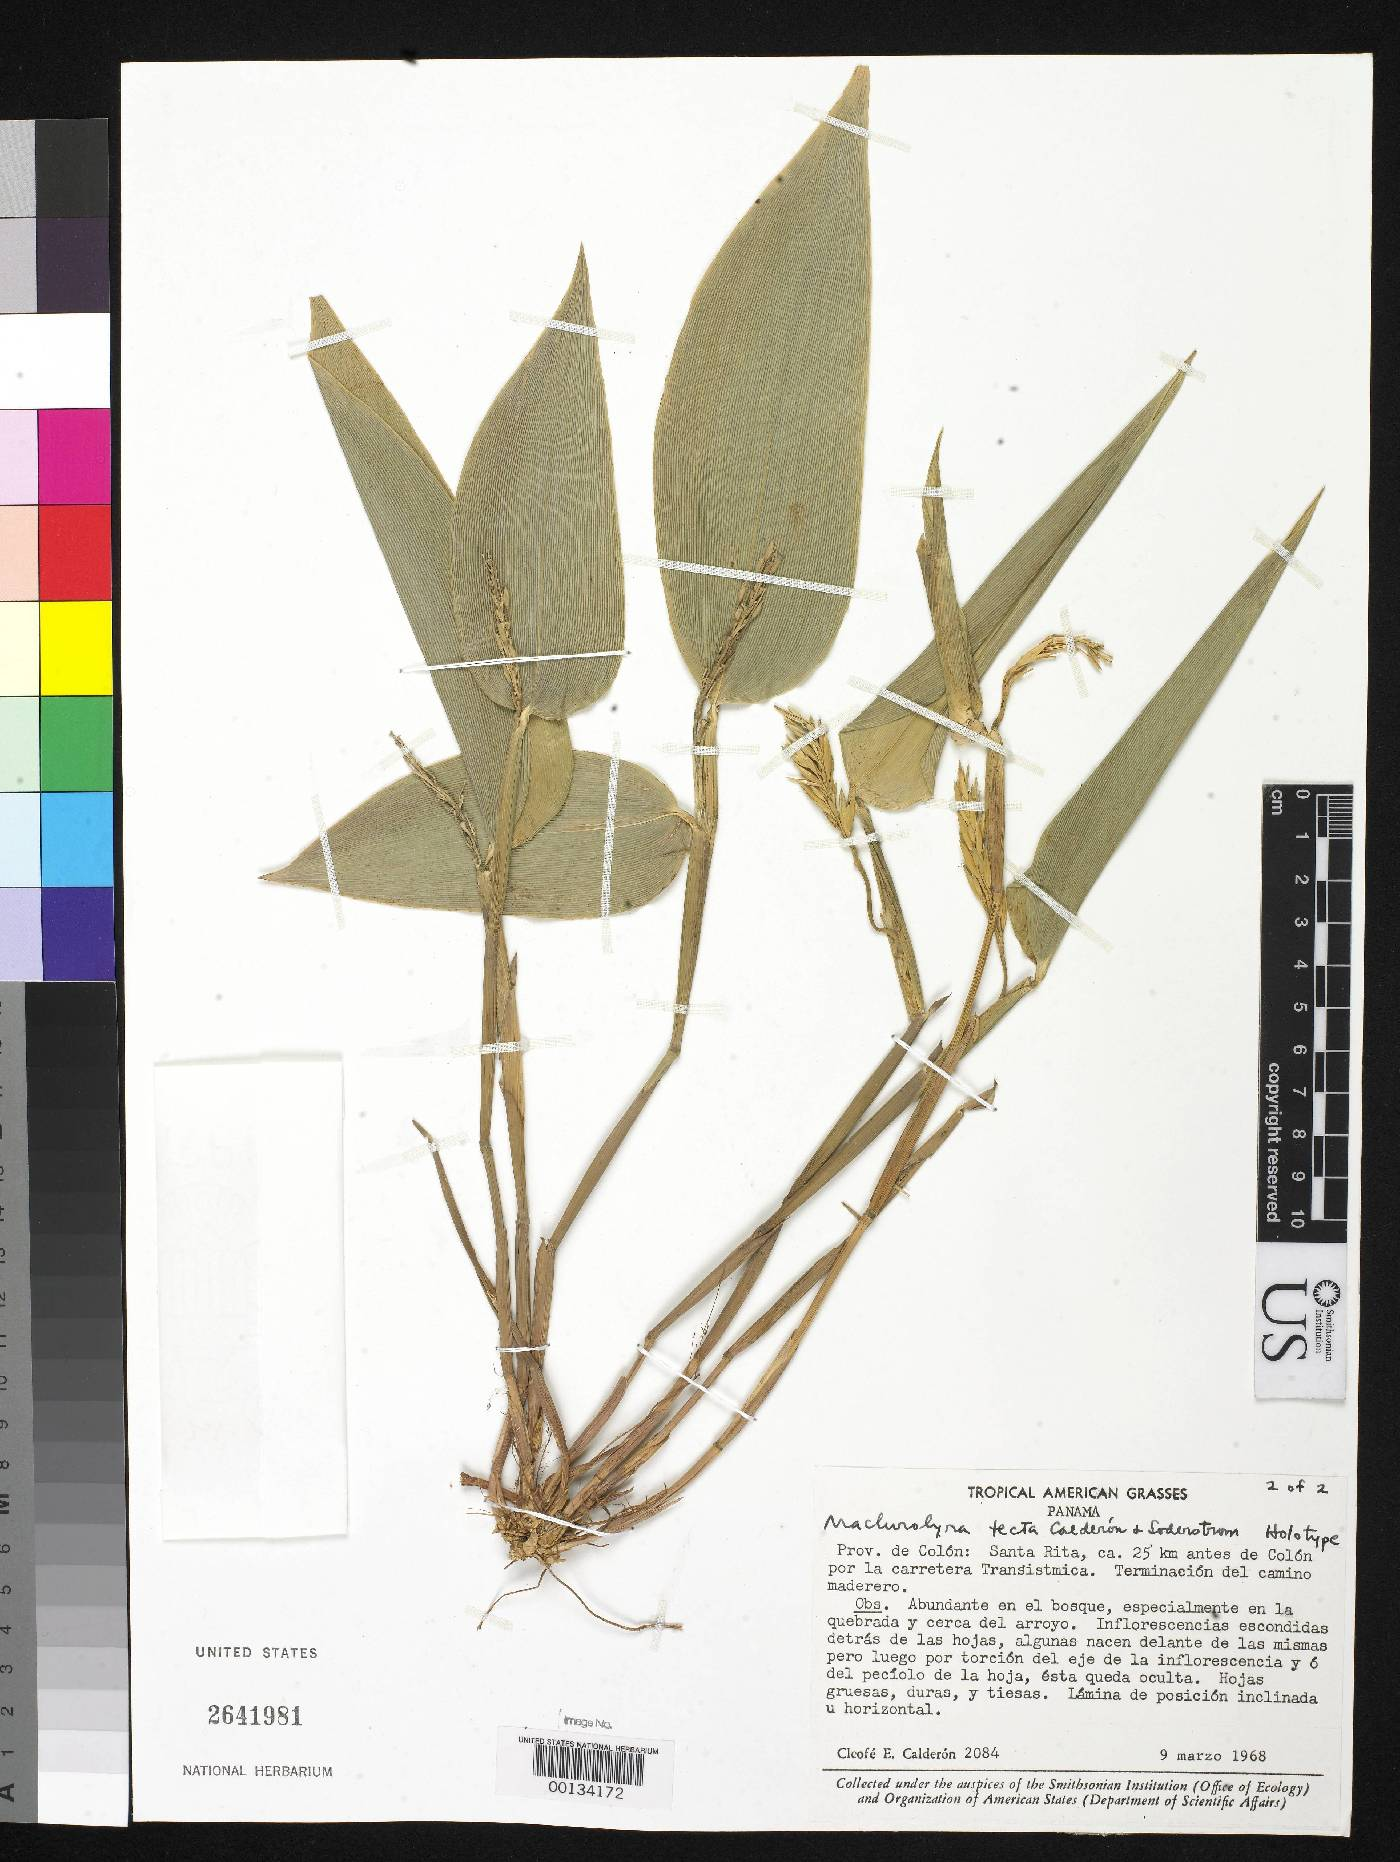 Maclurolyra tecta image